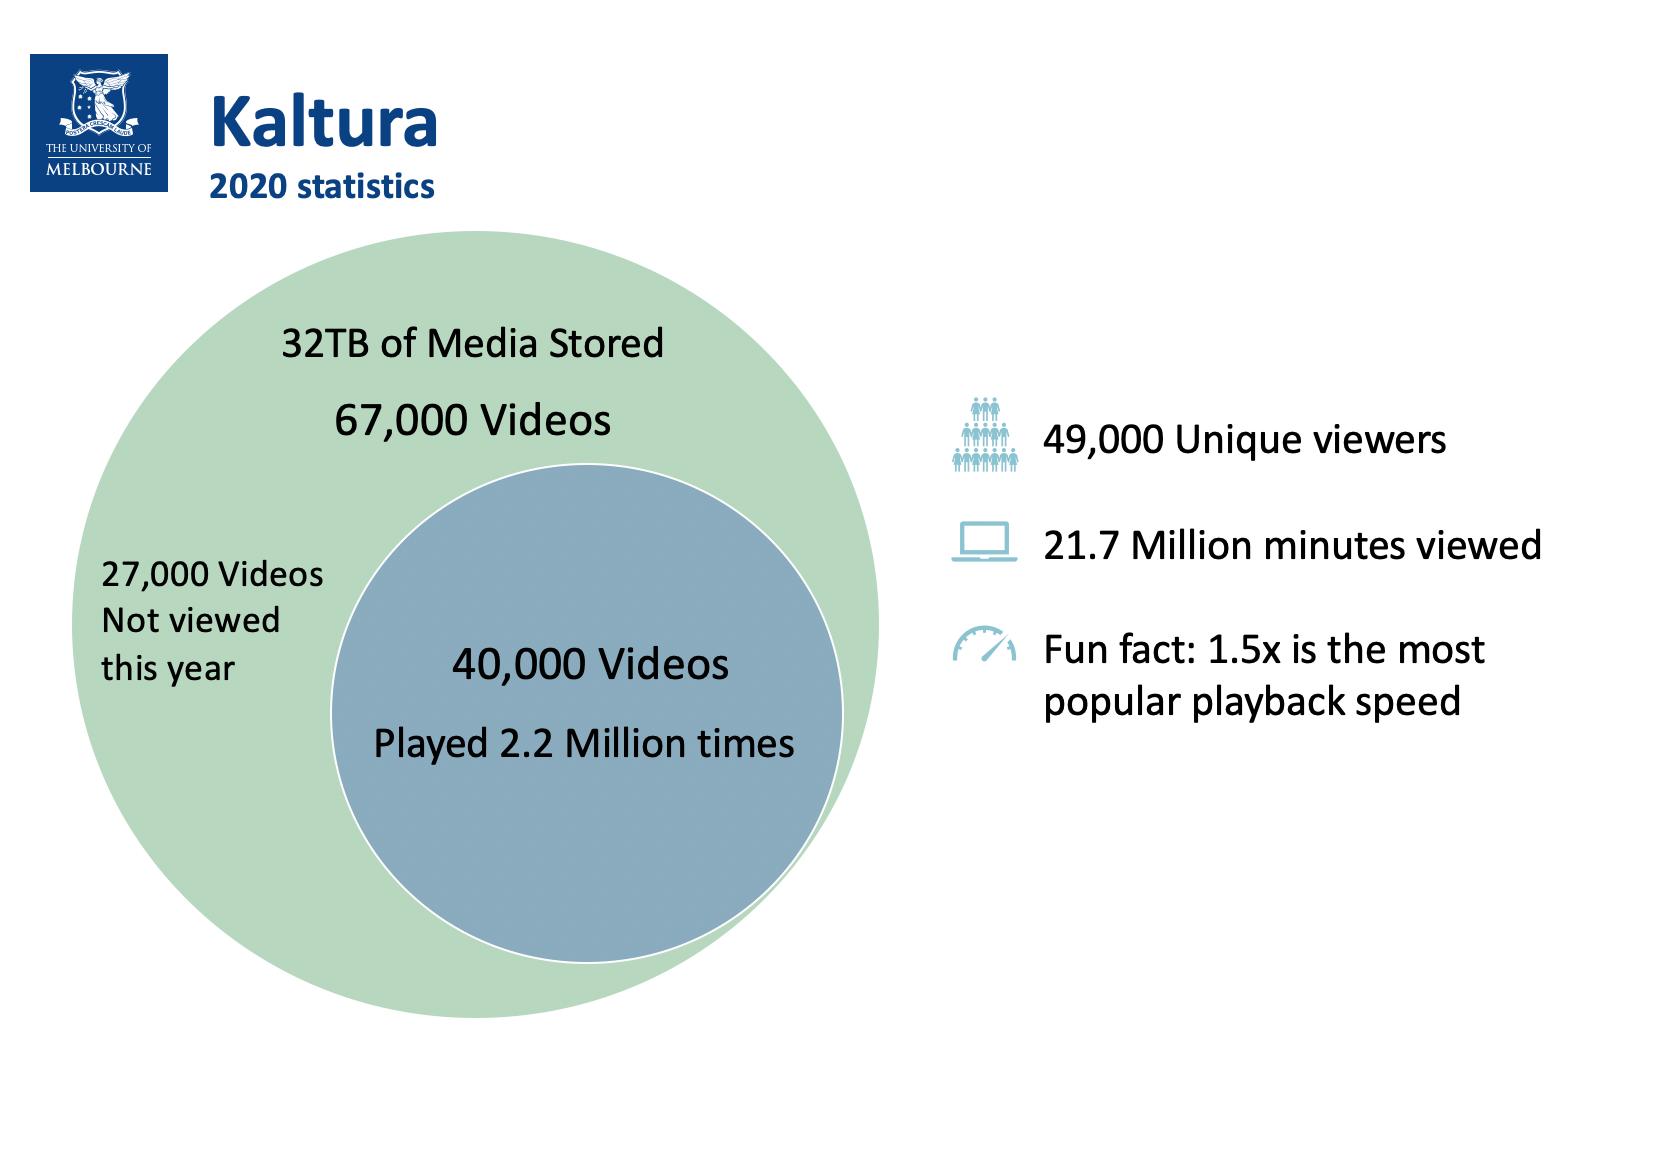 Charts showing Kaltura statistics 2020